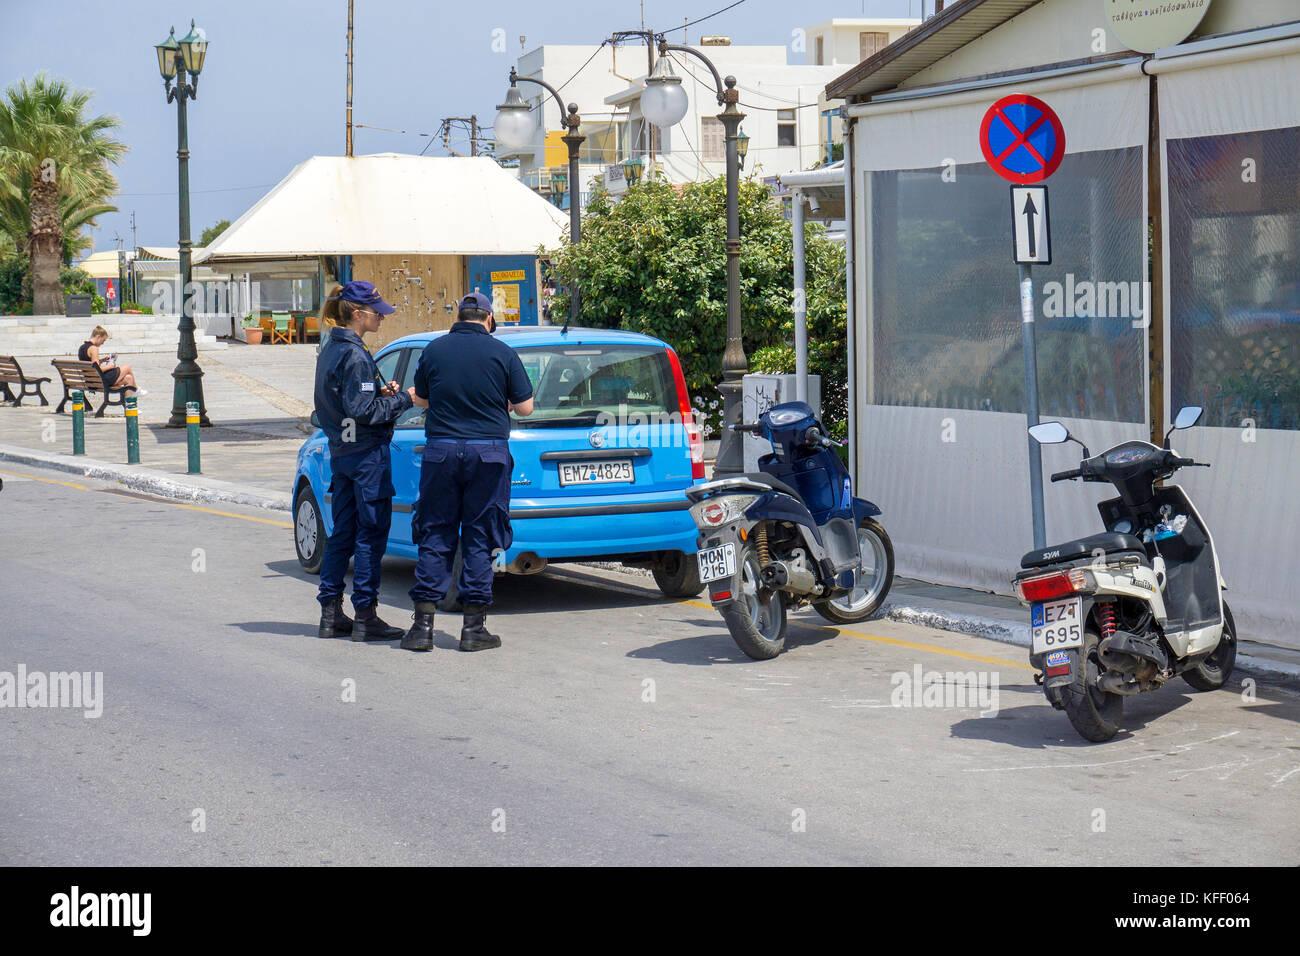 Greek traffic police at a car parking at no waiting, Naxos-town, Naxos island, Cyclades, Aegean, Greece Stock Photo